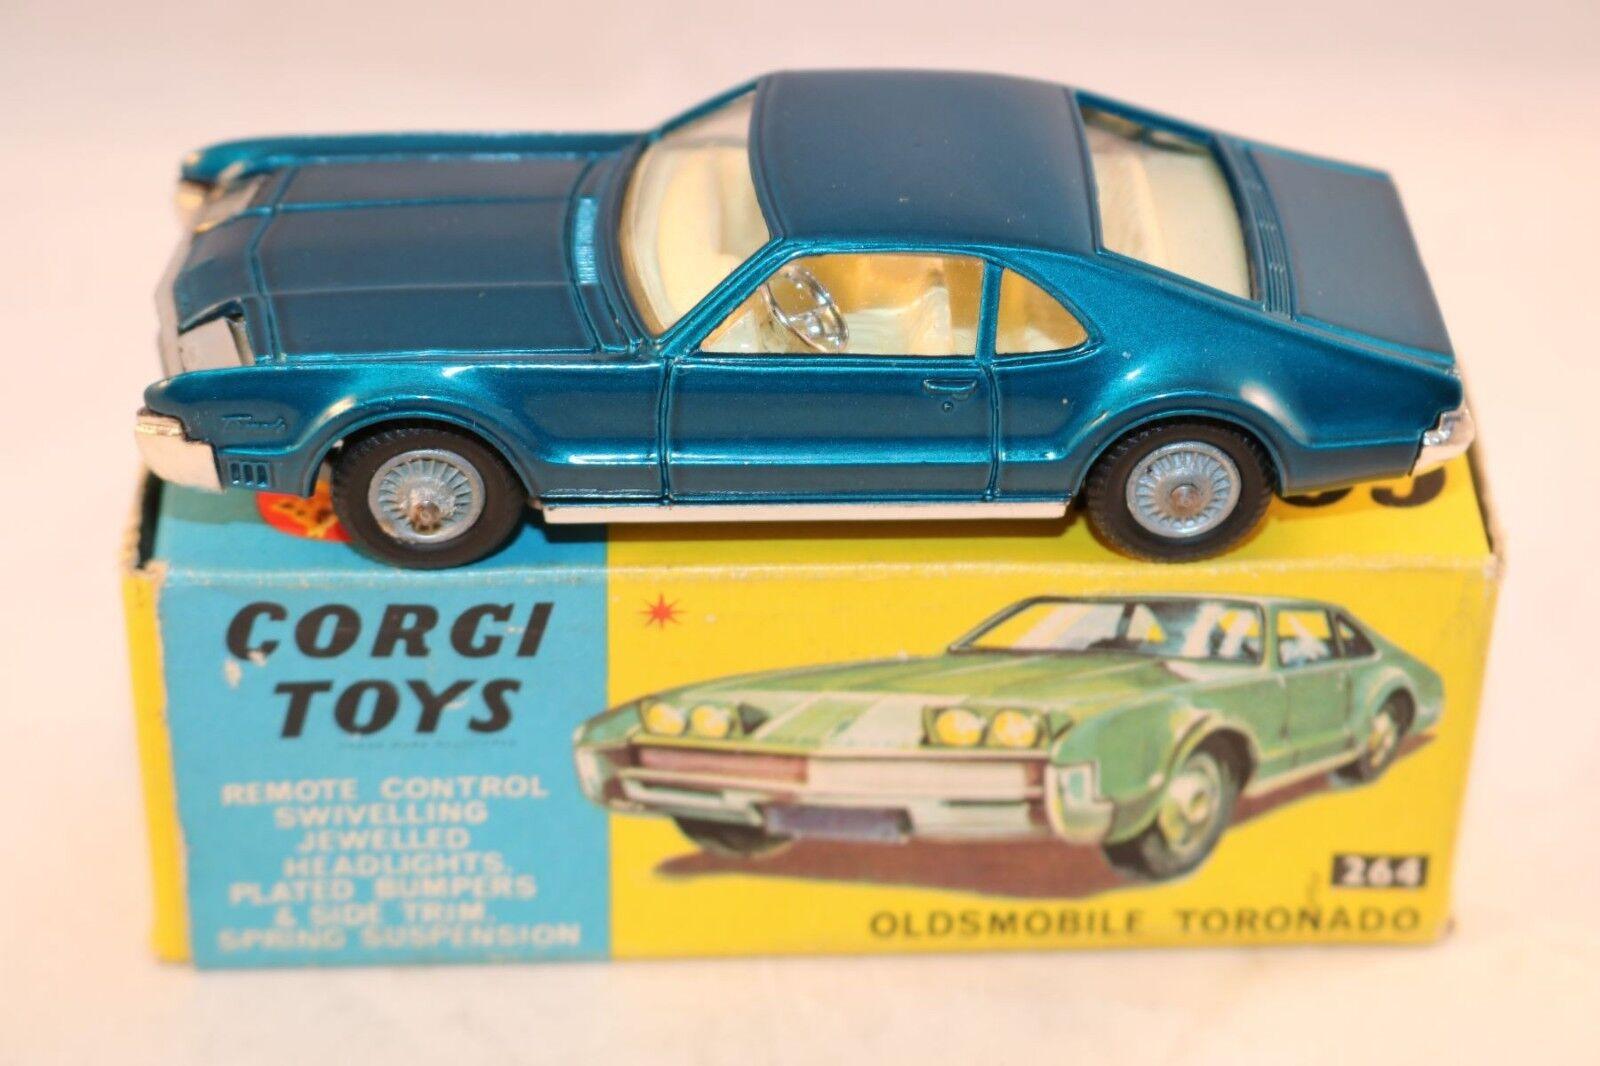 Corgi giocattoli 264 Oldsmobile Toronado blu version mint in scatola tutti original